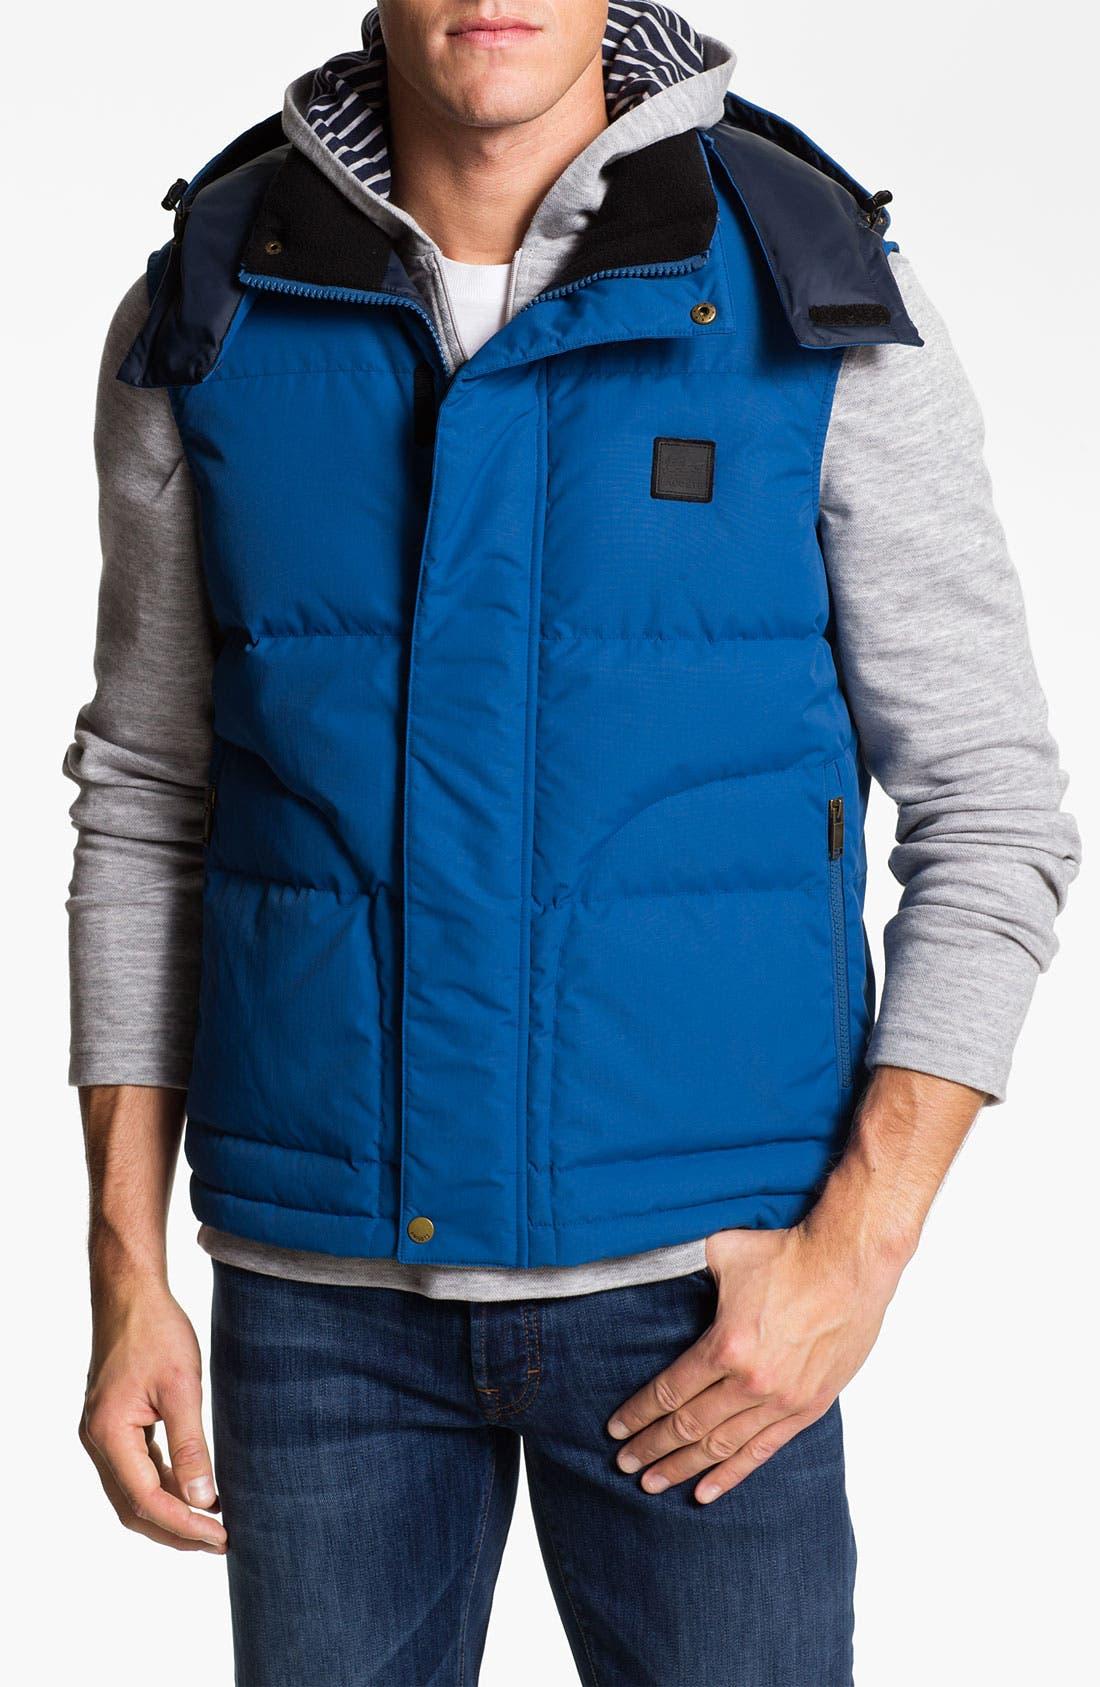 Alternate Image 1 Selected - Lacoste Zip Hooded Vest